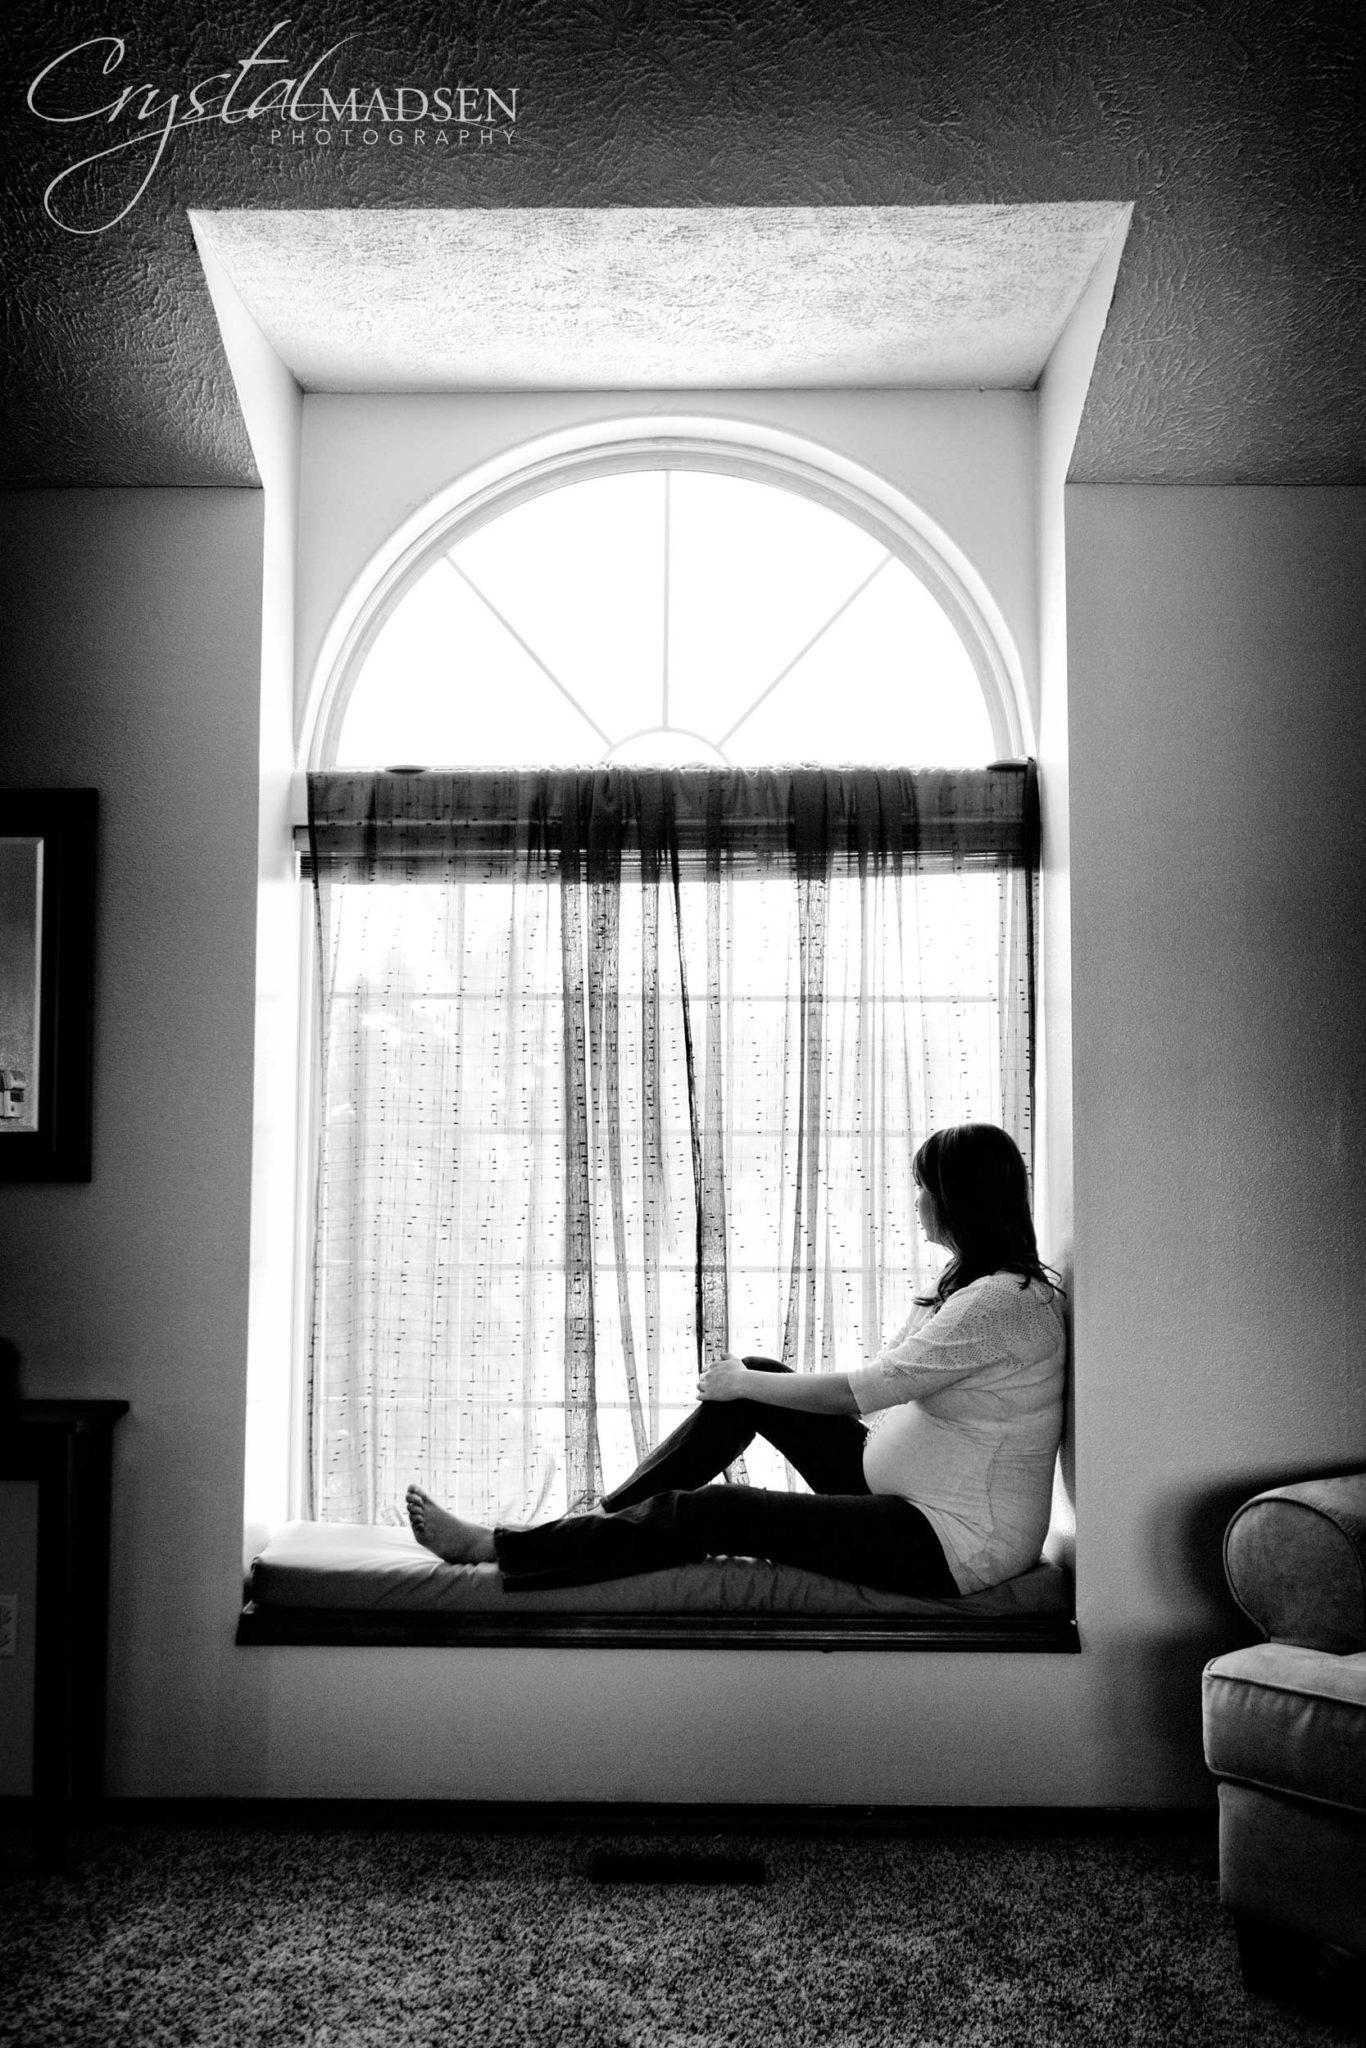 Window Maternity Photos